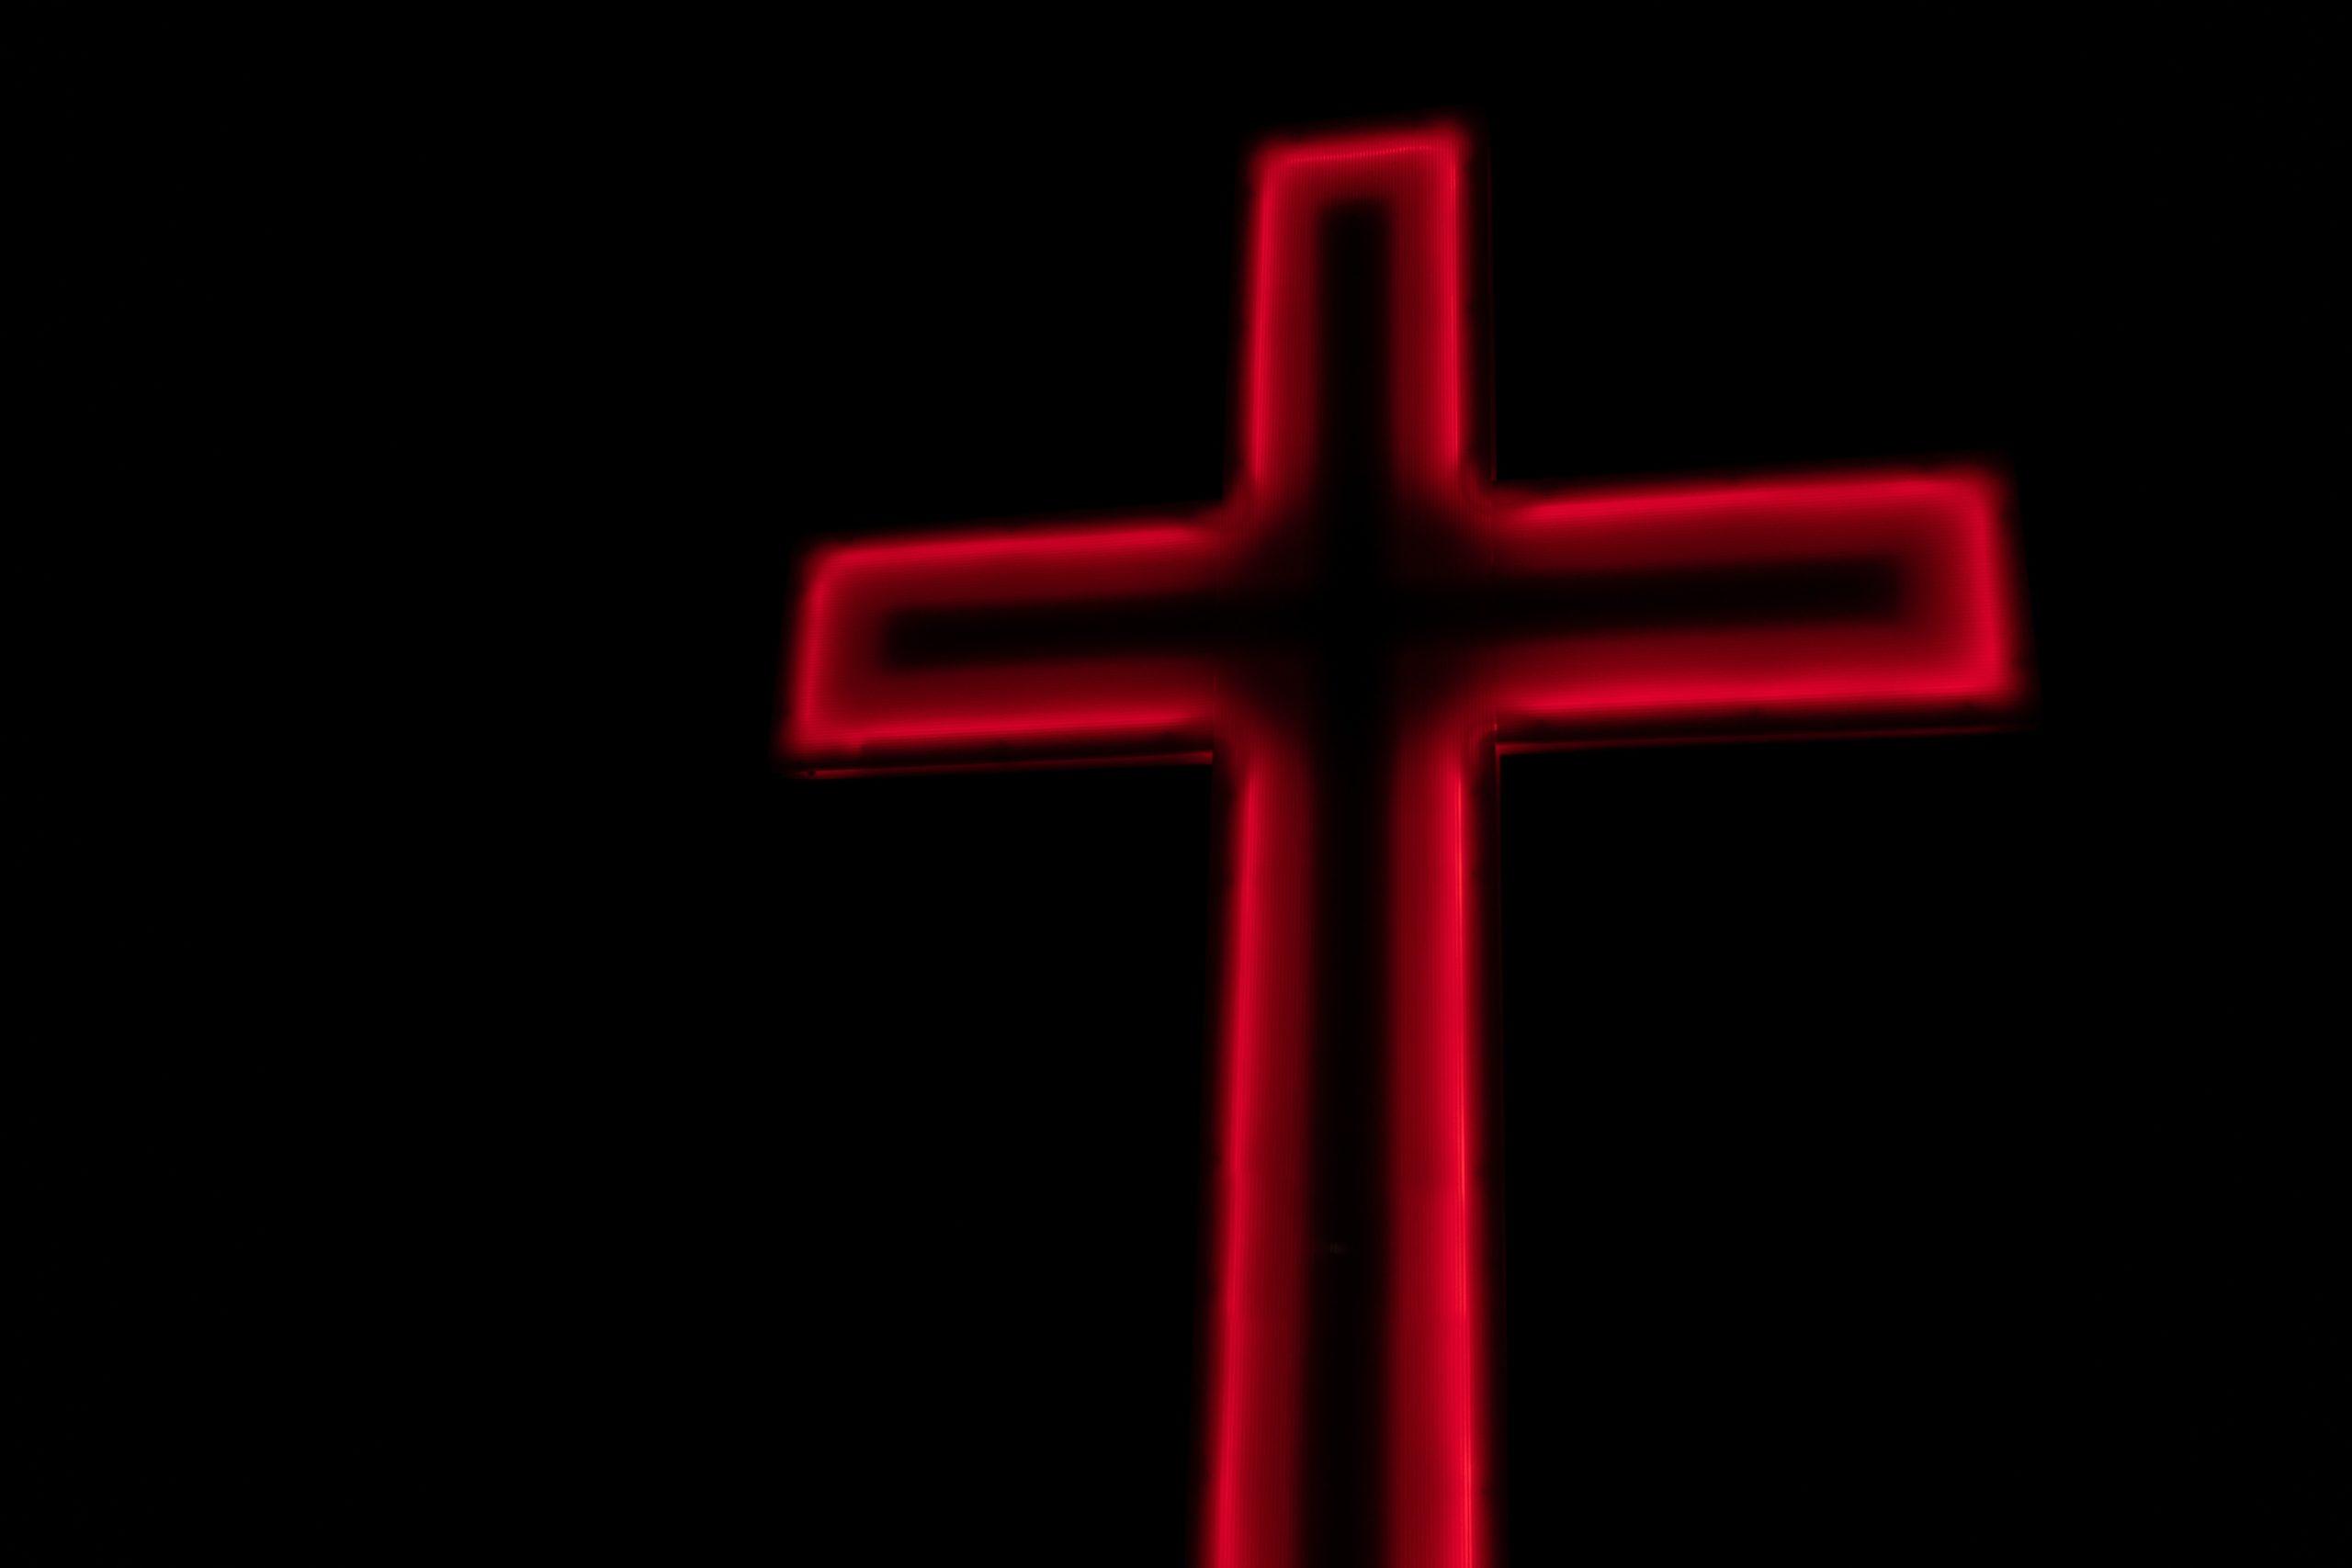 … i krwawy pot leje – Dobre Nowiny